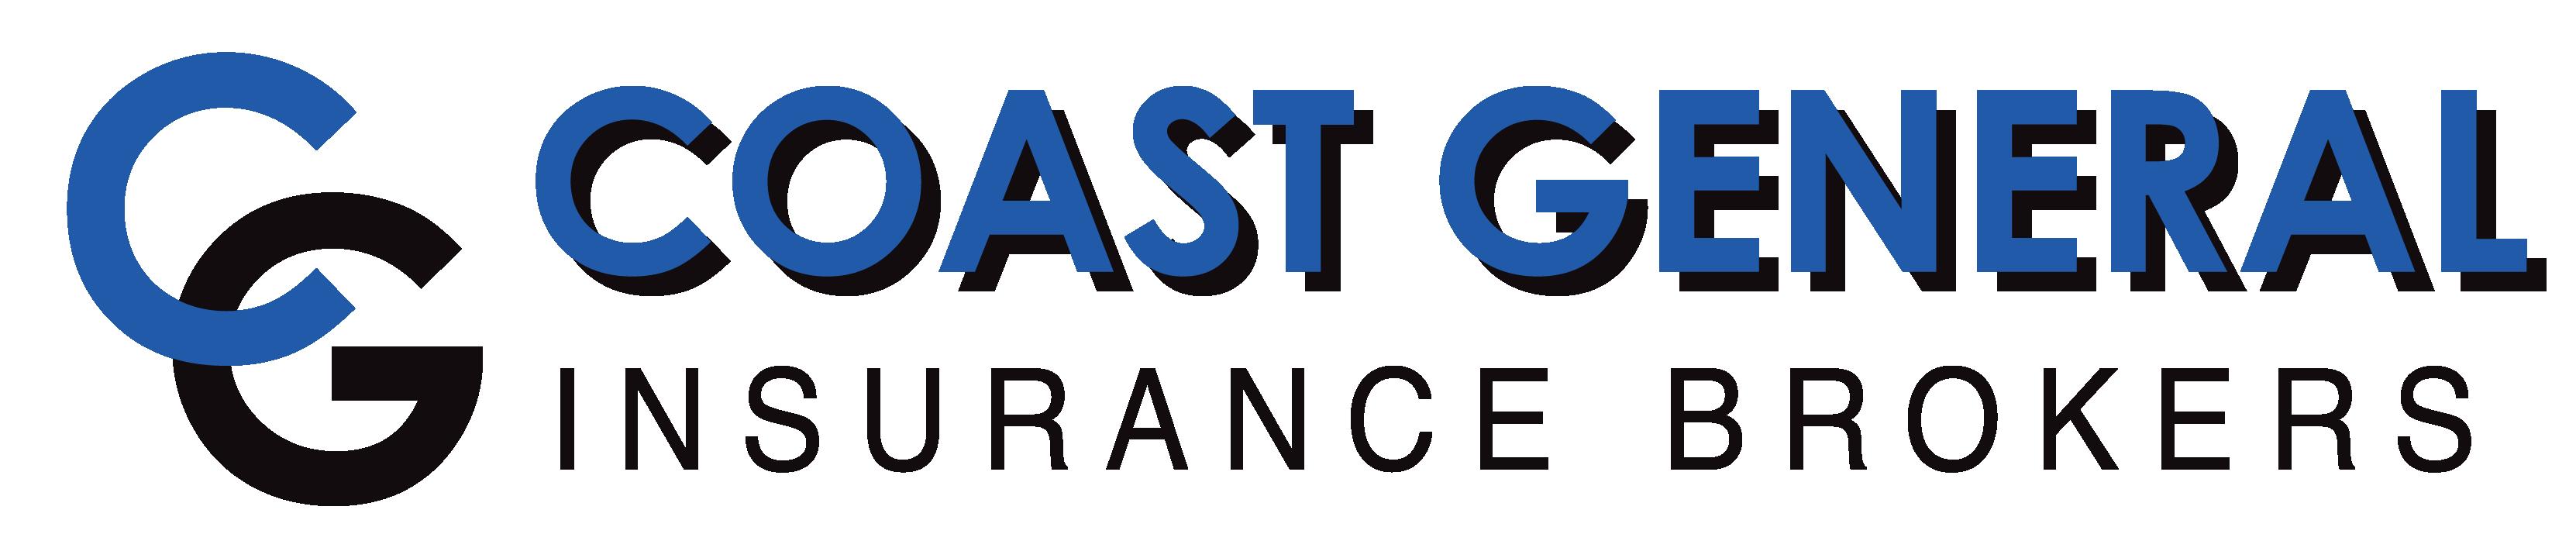 Coast General Insurance Brokers